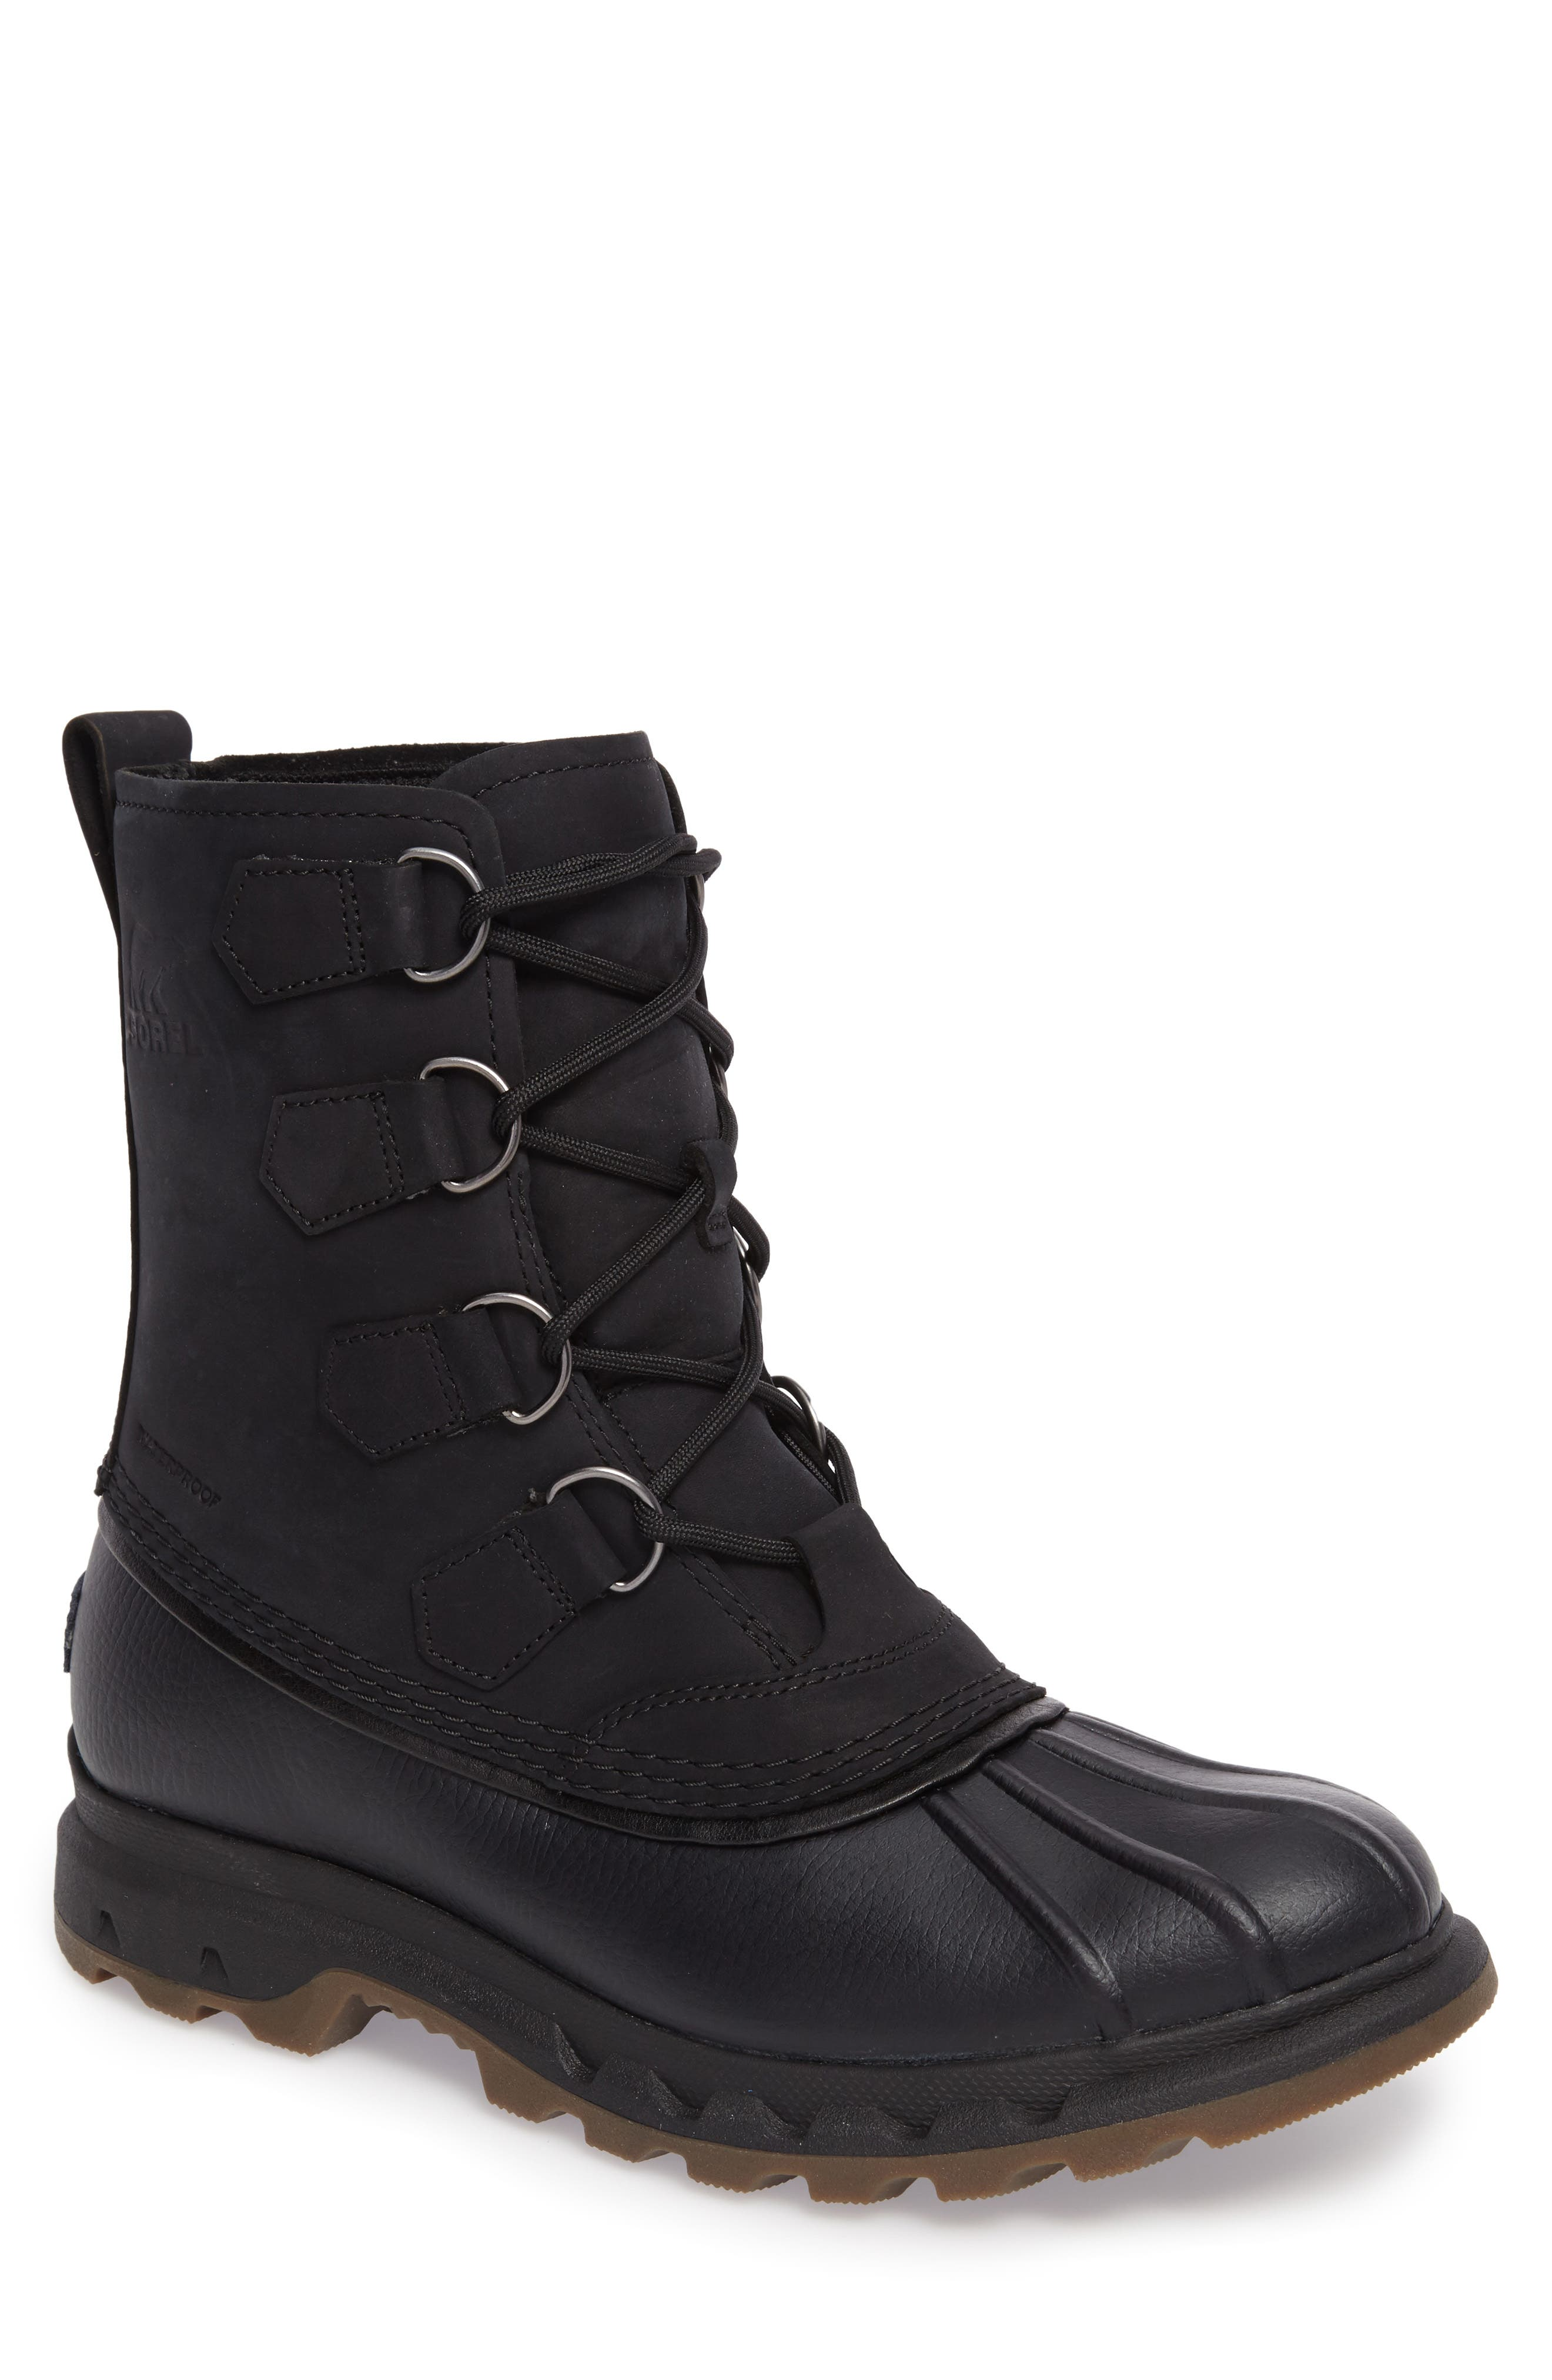 Alternate Image 1 Selected - Sorel Portzman Classic Rain Boot (Men)